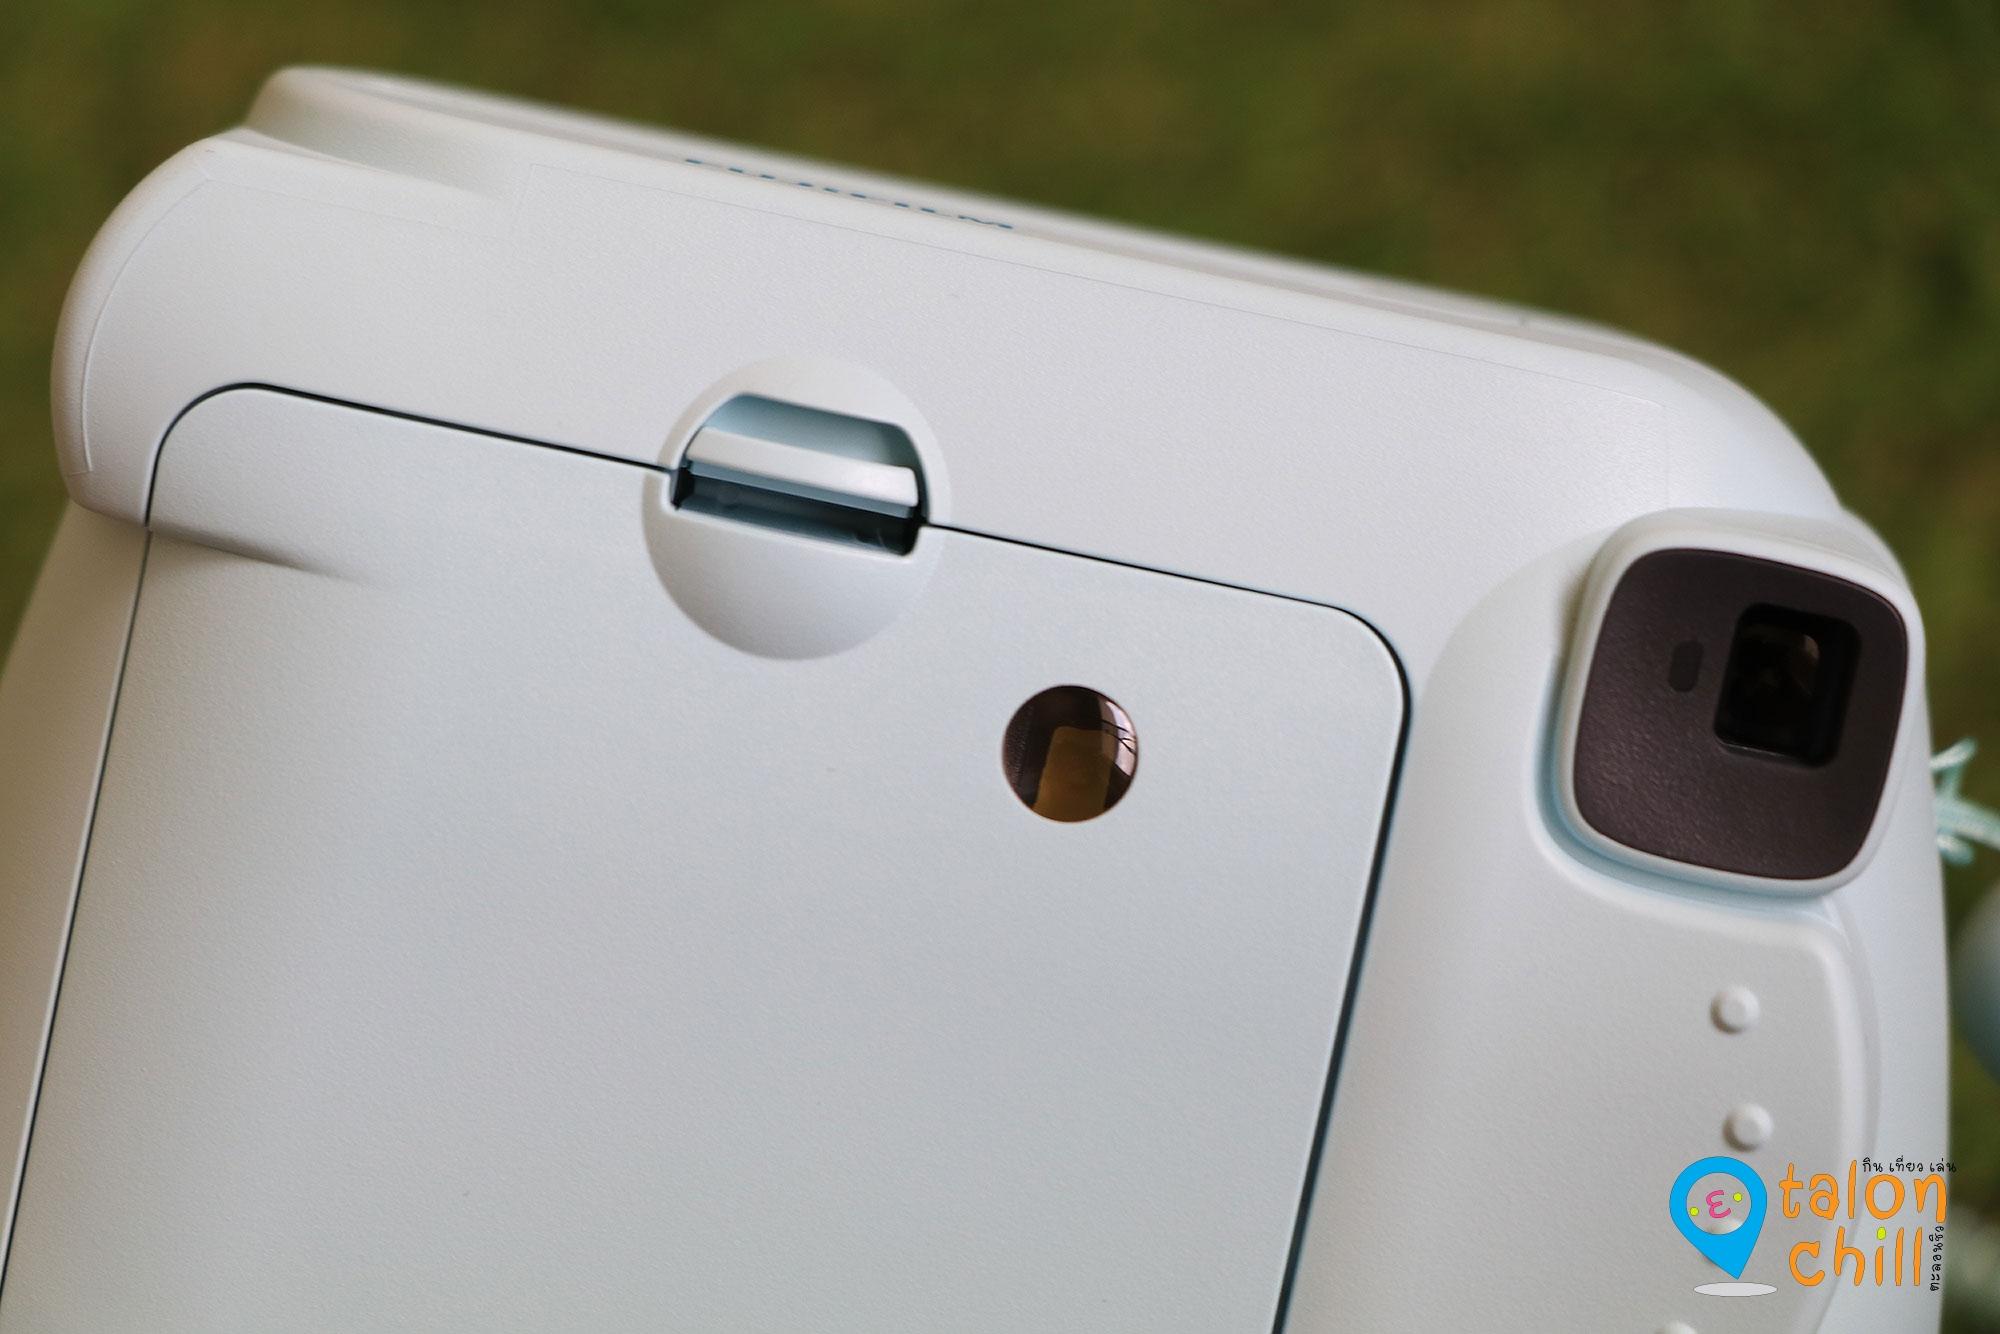 [Review] FUJIFILM Instax Mini 8 (กล้องโพลารอยด์) One Day In Memory By FUJIFILM